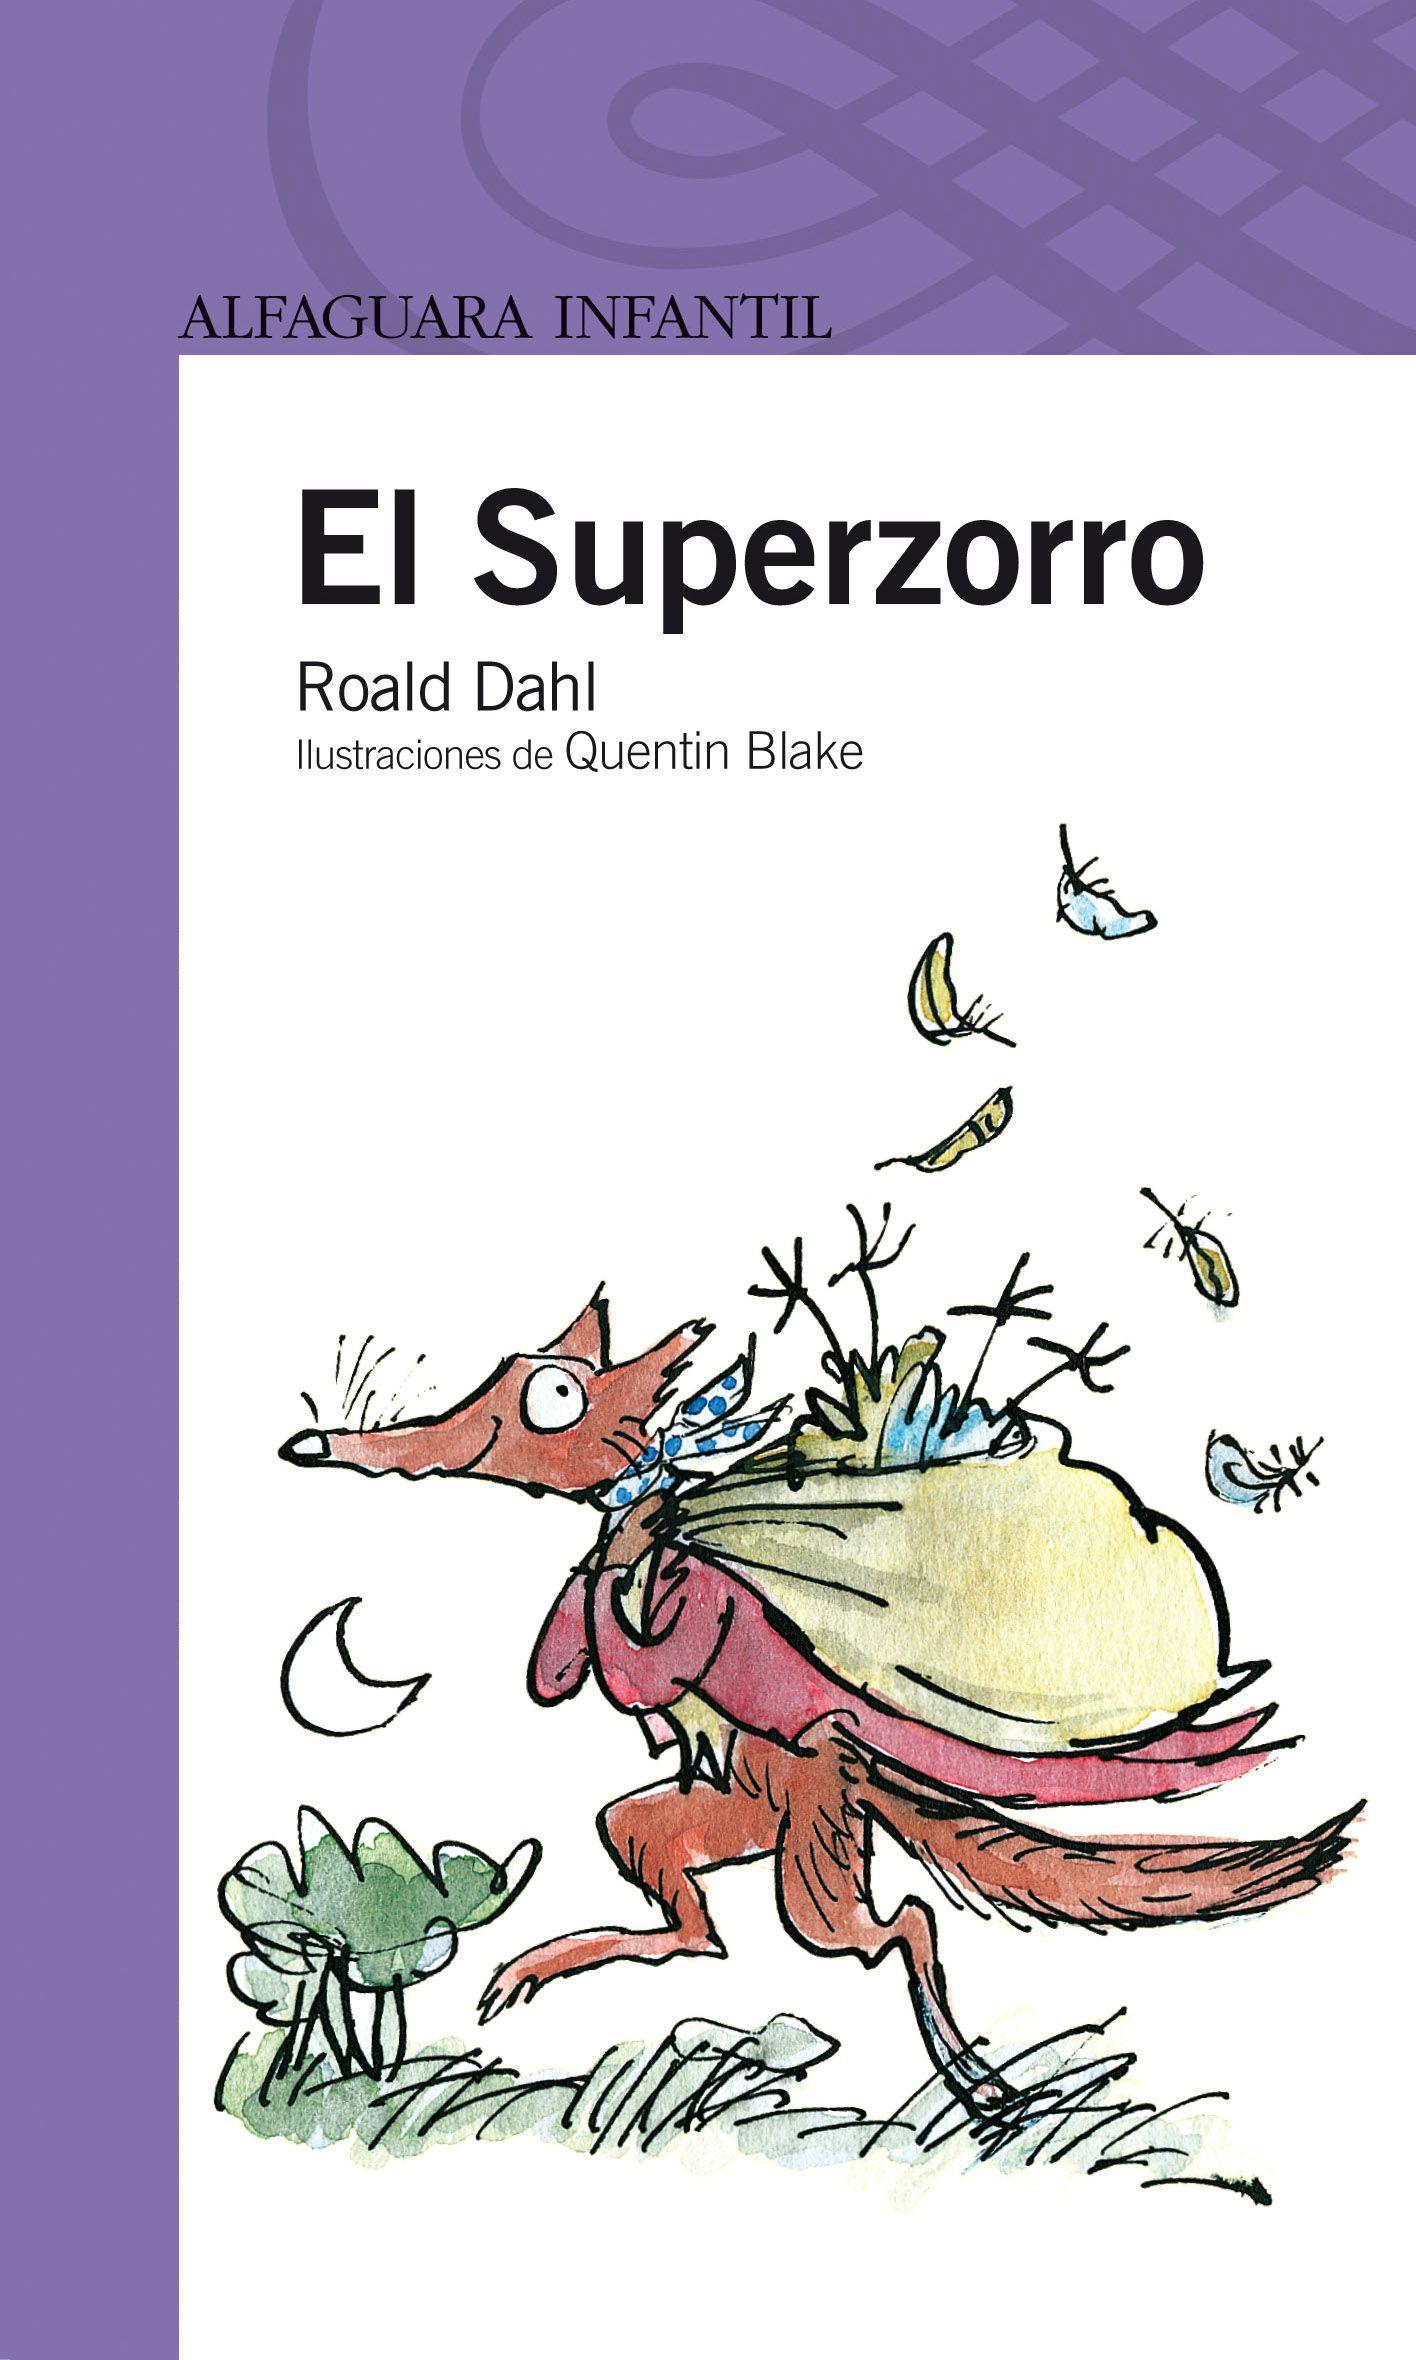 roald dahl short stories volume 2 pdf